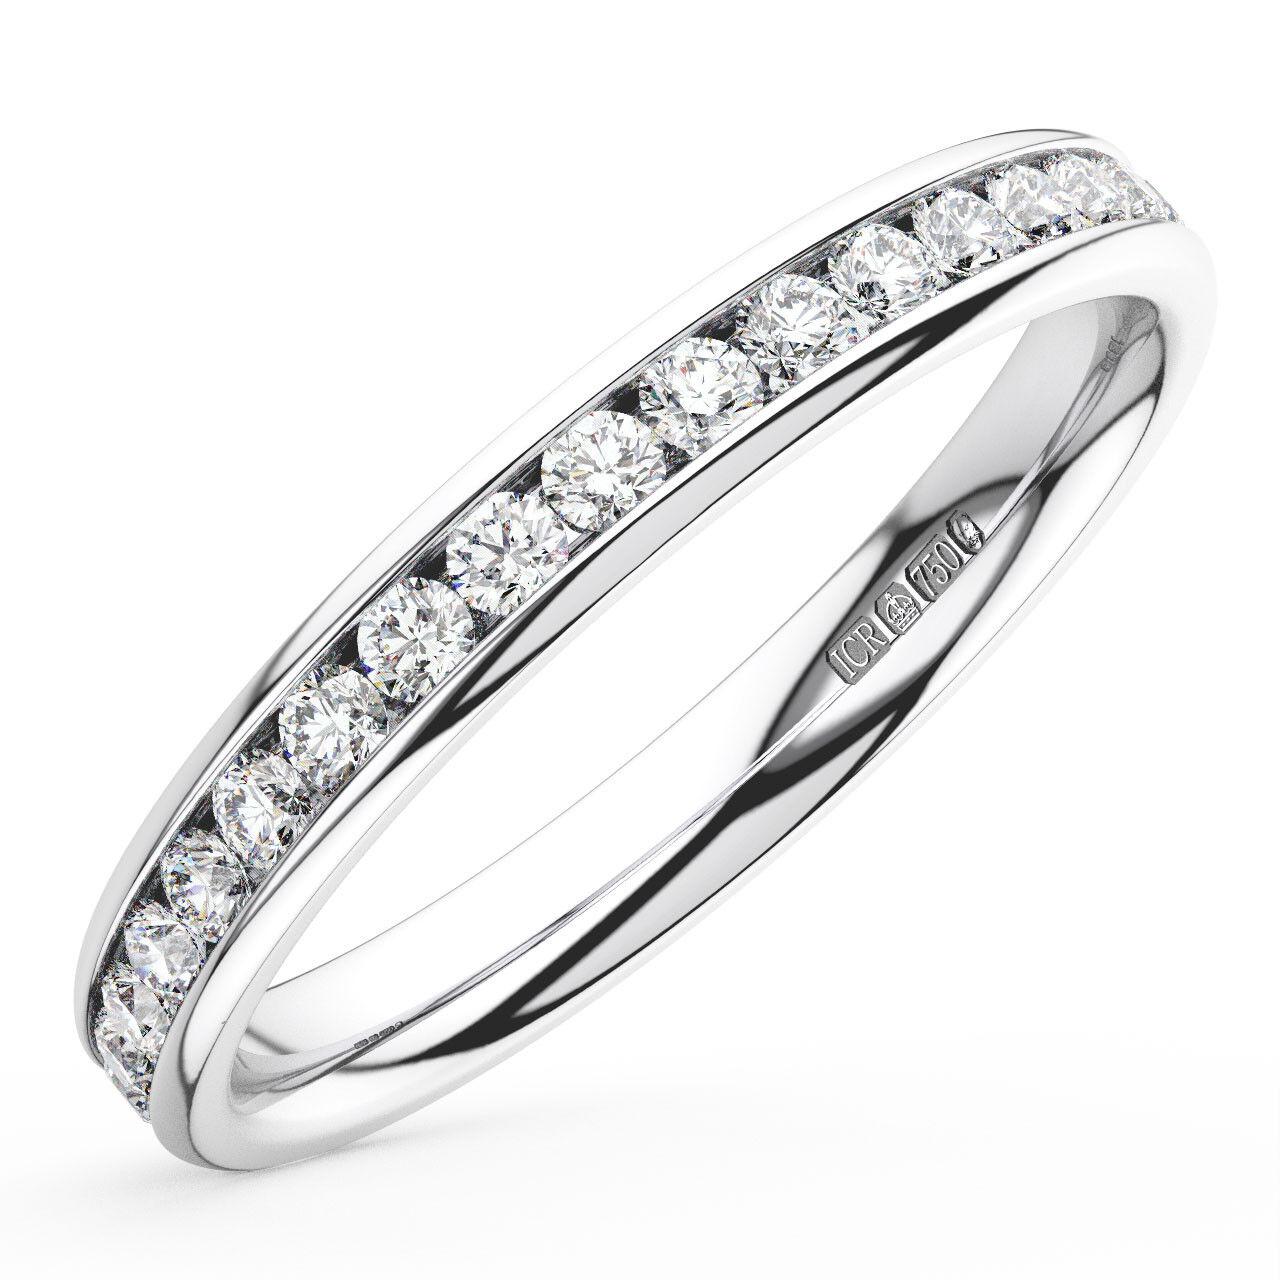 0.50CT Round Brilliant Cut Diamonds Full Eternity Wedding Ring in 18K White gold